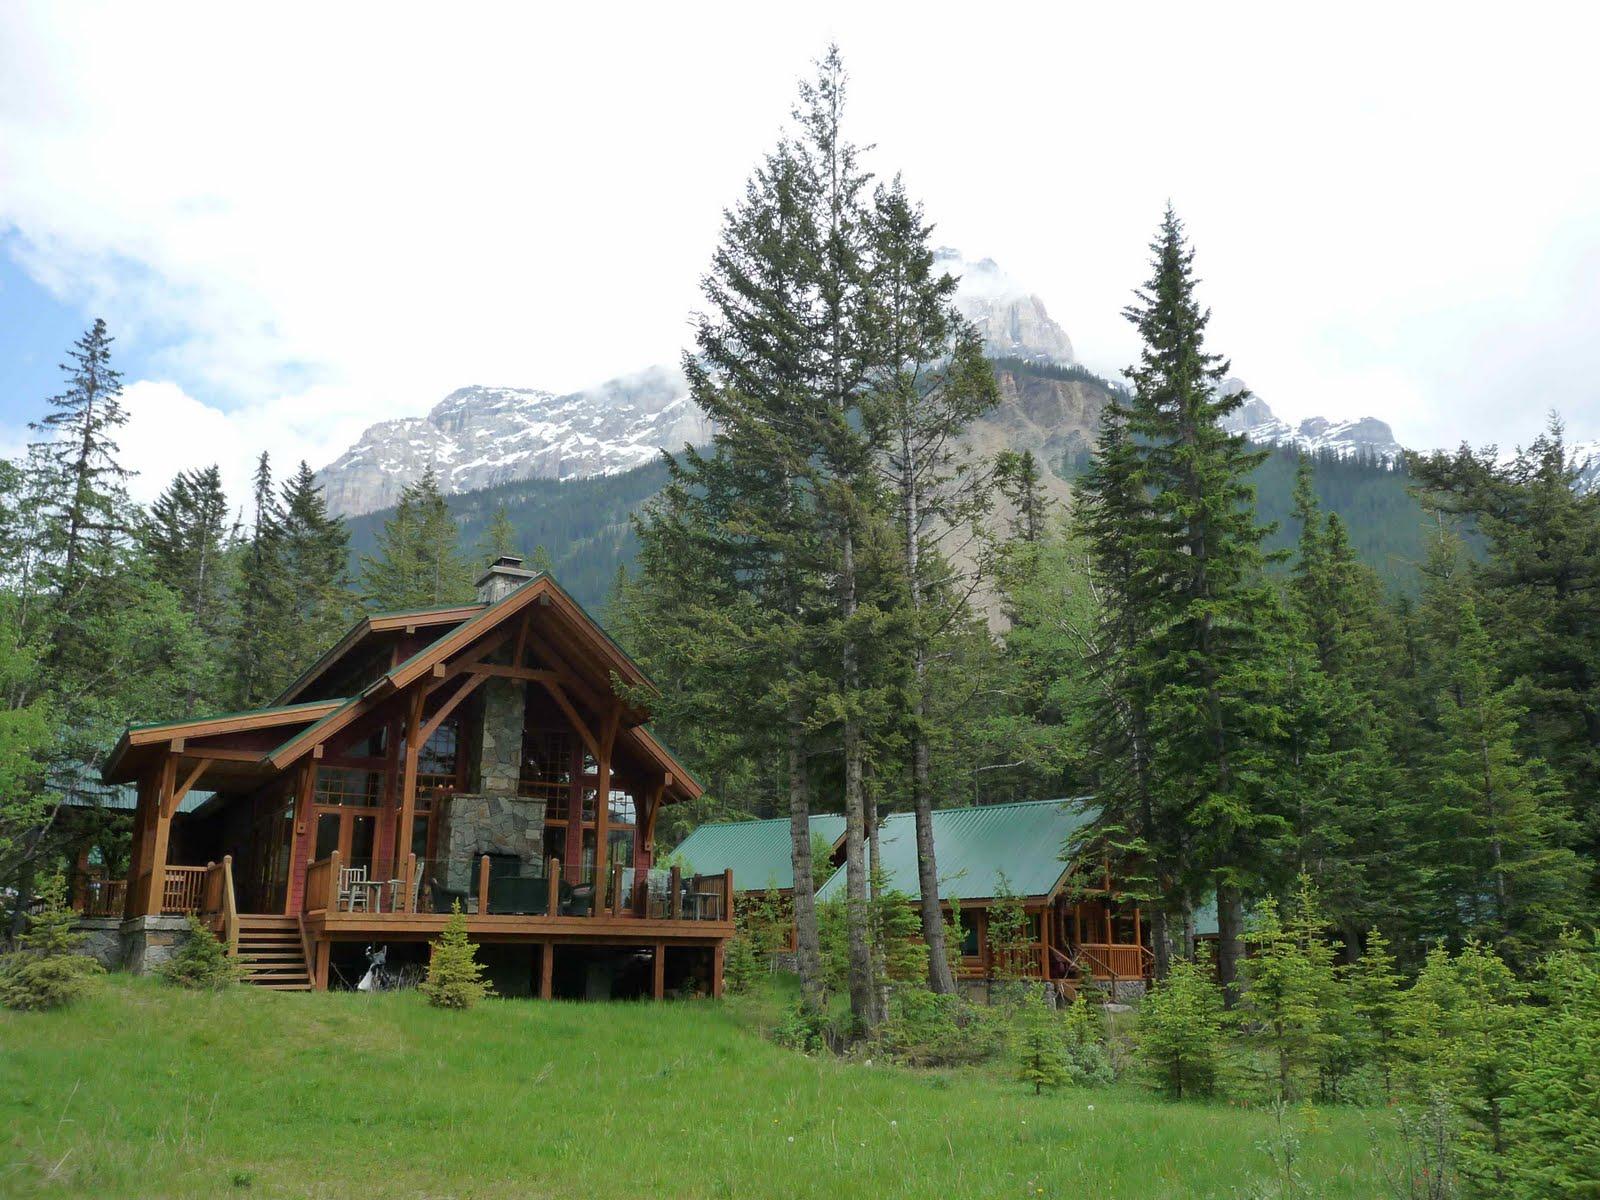 north traveller canada yoho park cathedral mountain lodge. Black Bedroom Furniture Sets. Home Design Ideas